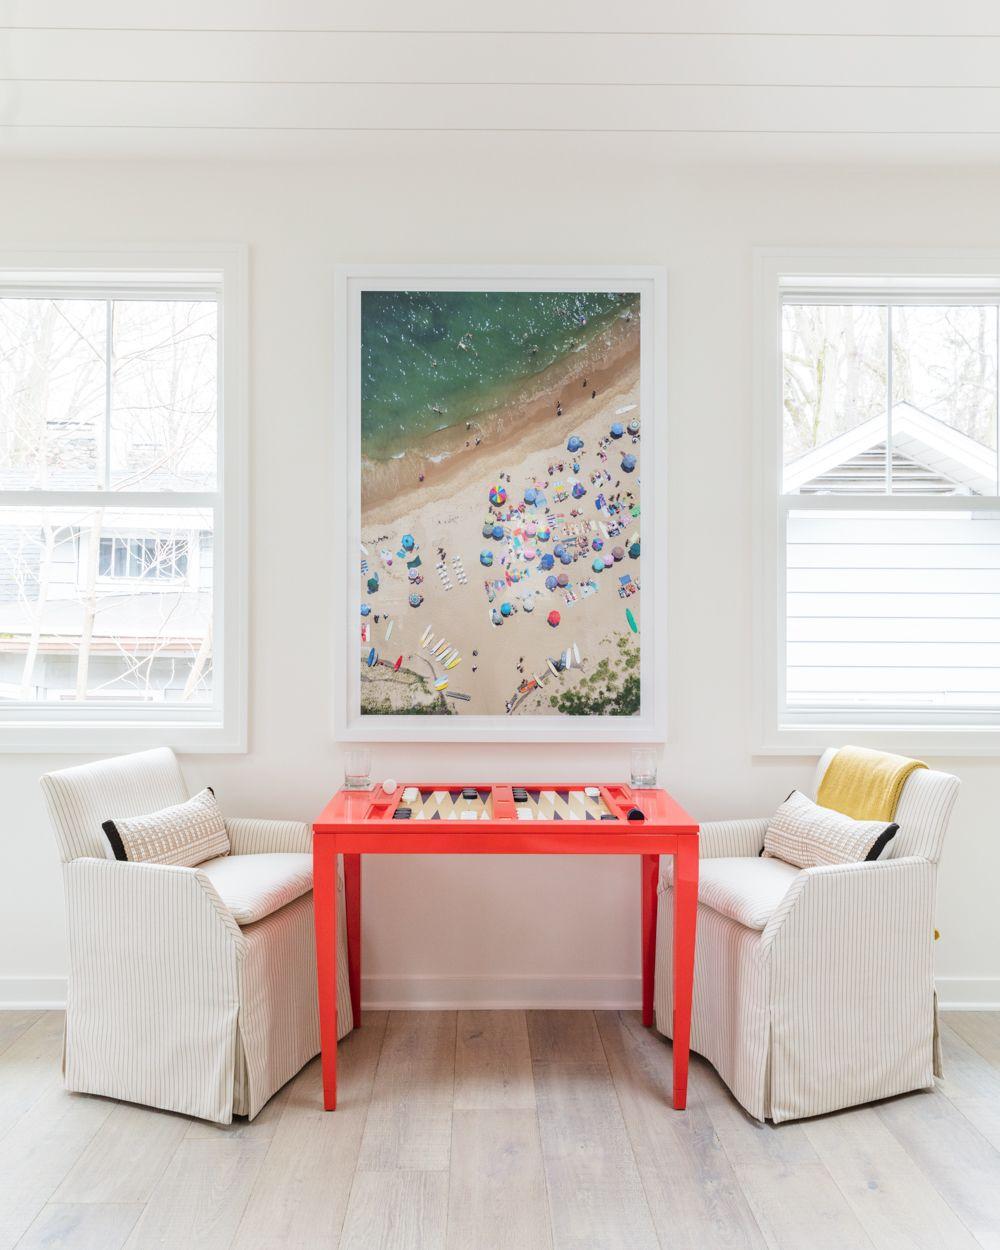 Bright-red-backgammon-table-and-Gray-Malin-photohraphy-88254